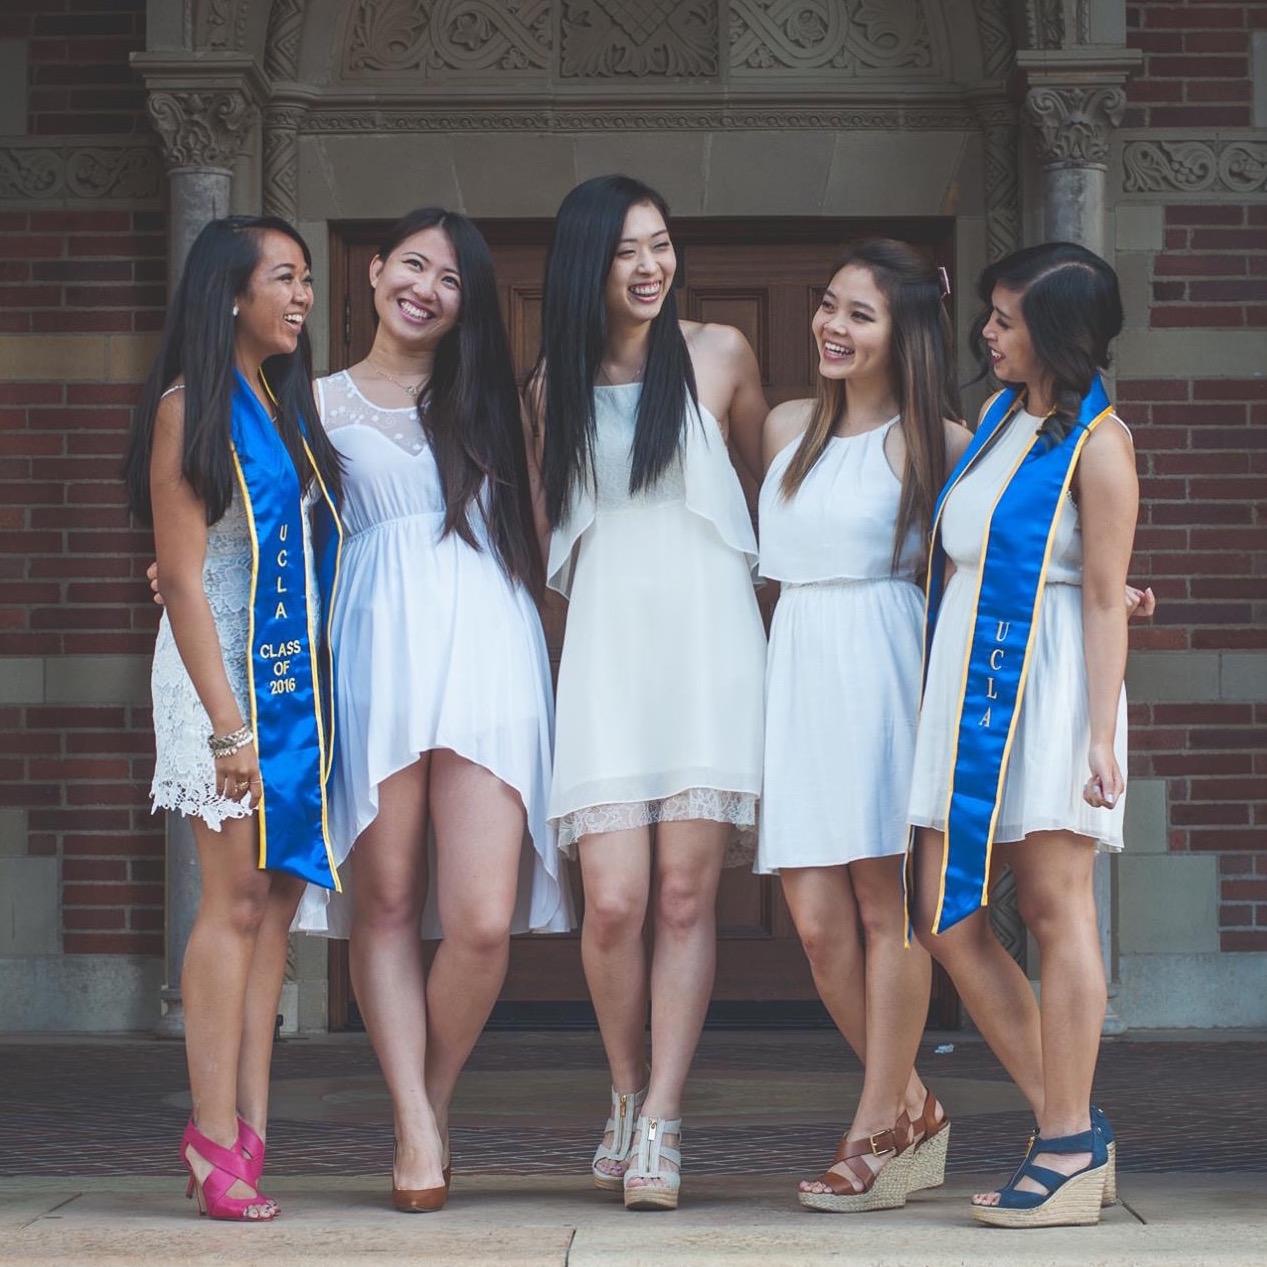 Embers' Graduation Photoshoot